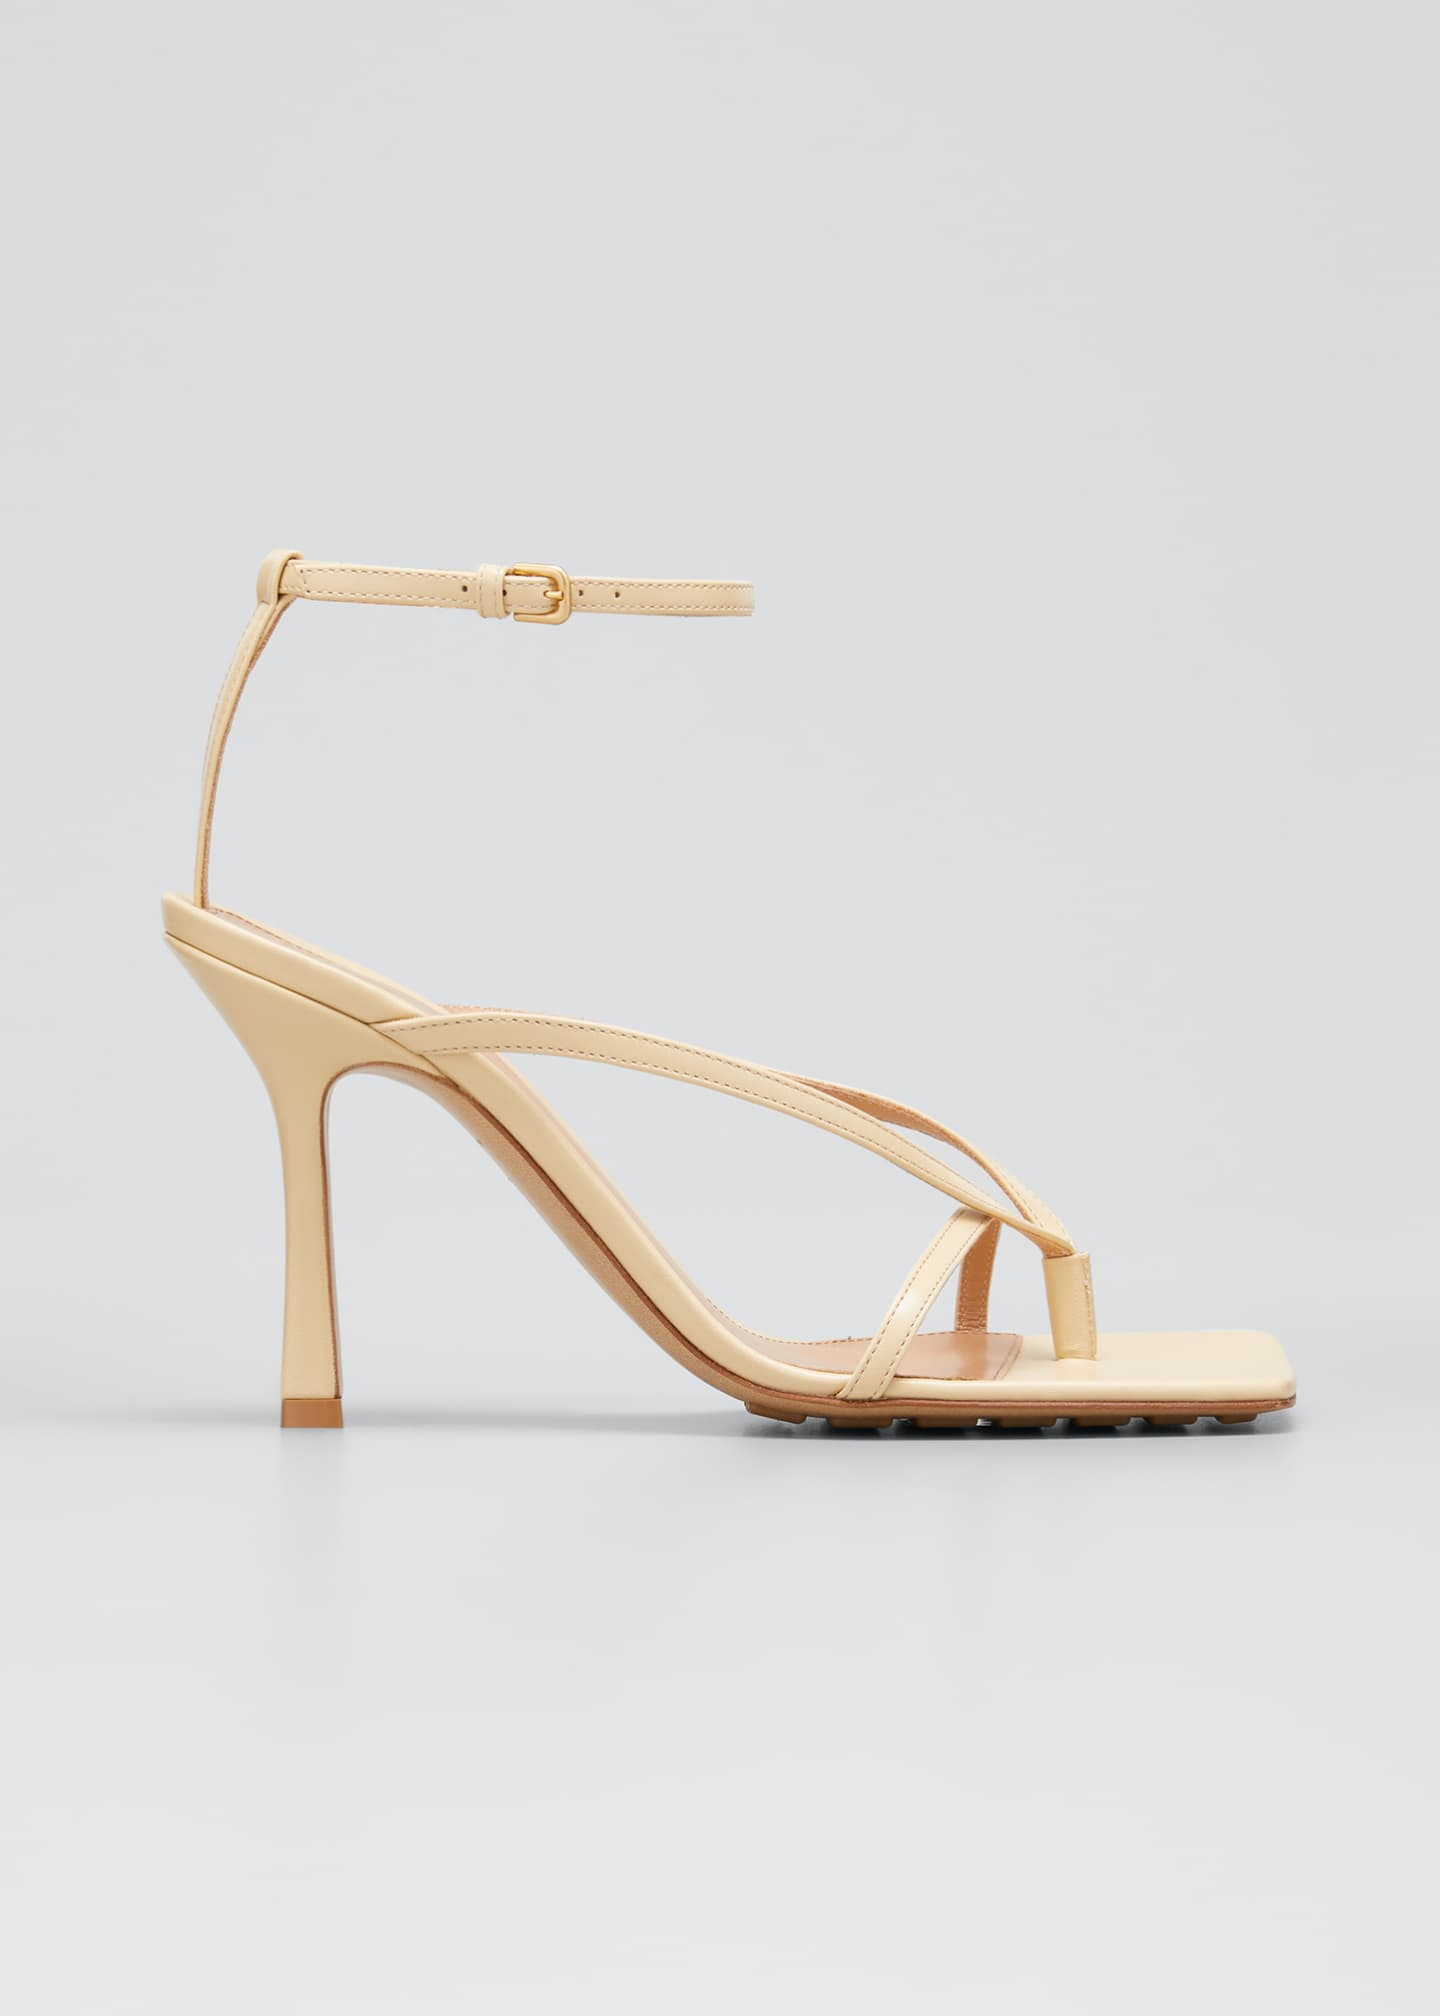 Multi Strap Stretch Sandals by Bottega-Veneta, available on bergdorfgoodman.com for $890 Hailey Baldwin Shoes Exact Product